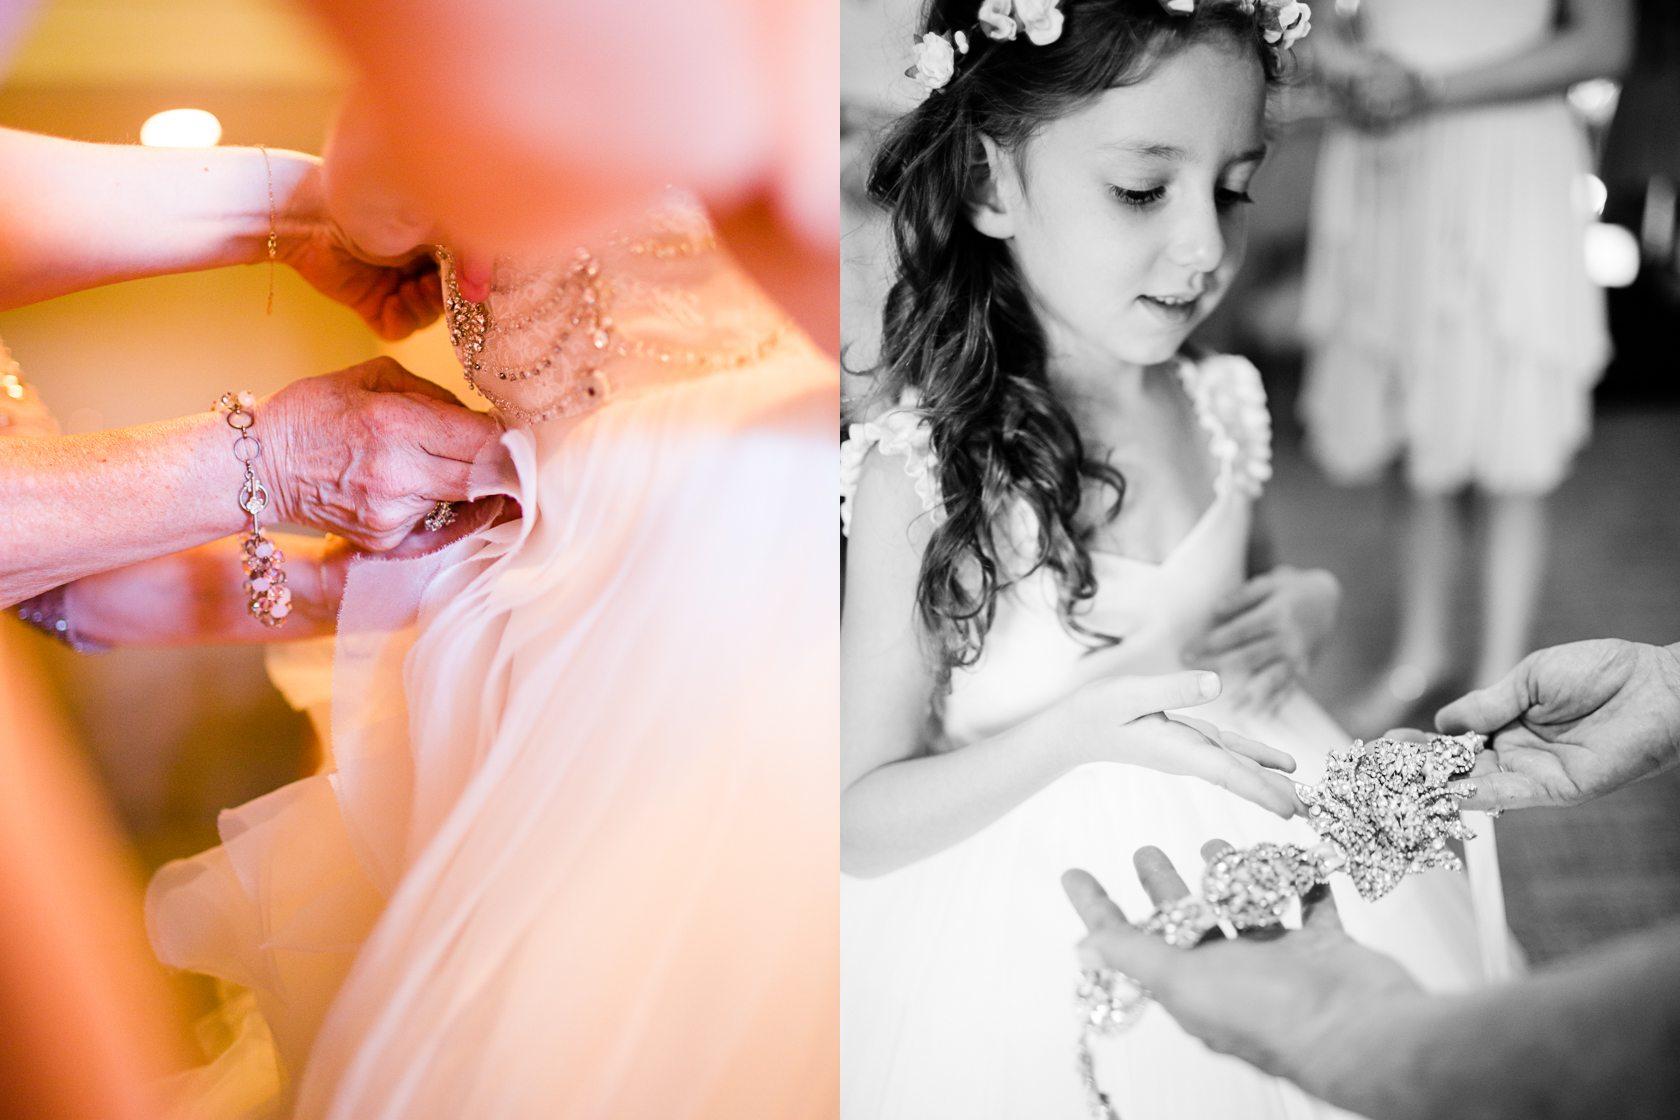 Temecula_Creek_Inn_Wedding_014.jpg